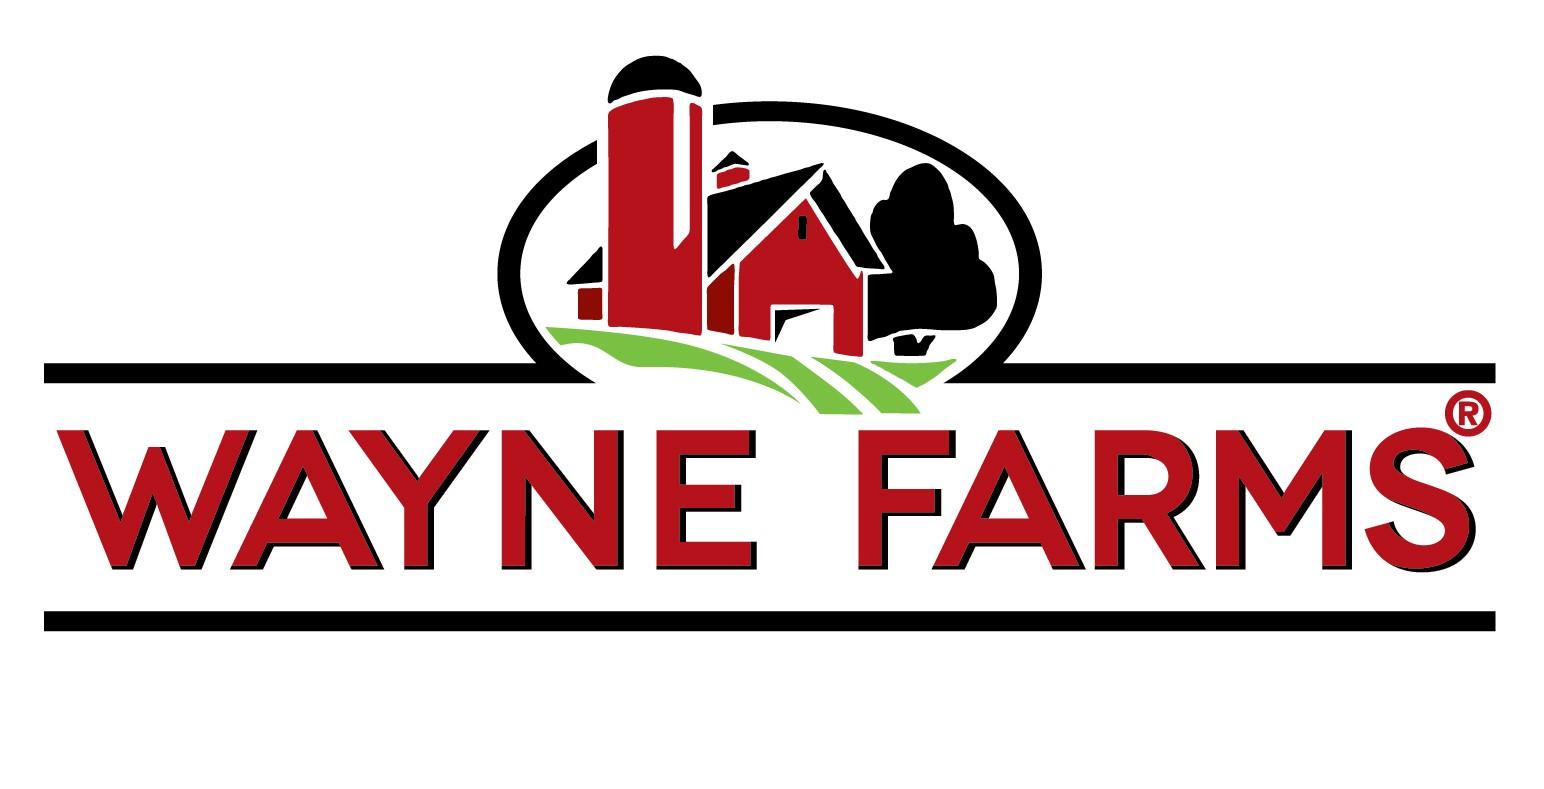 Waynefarms